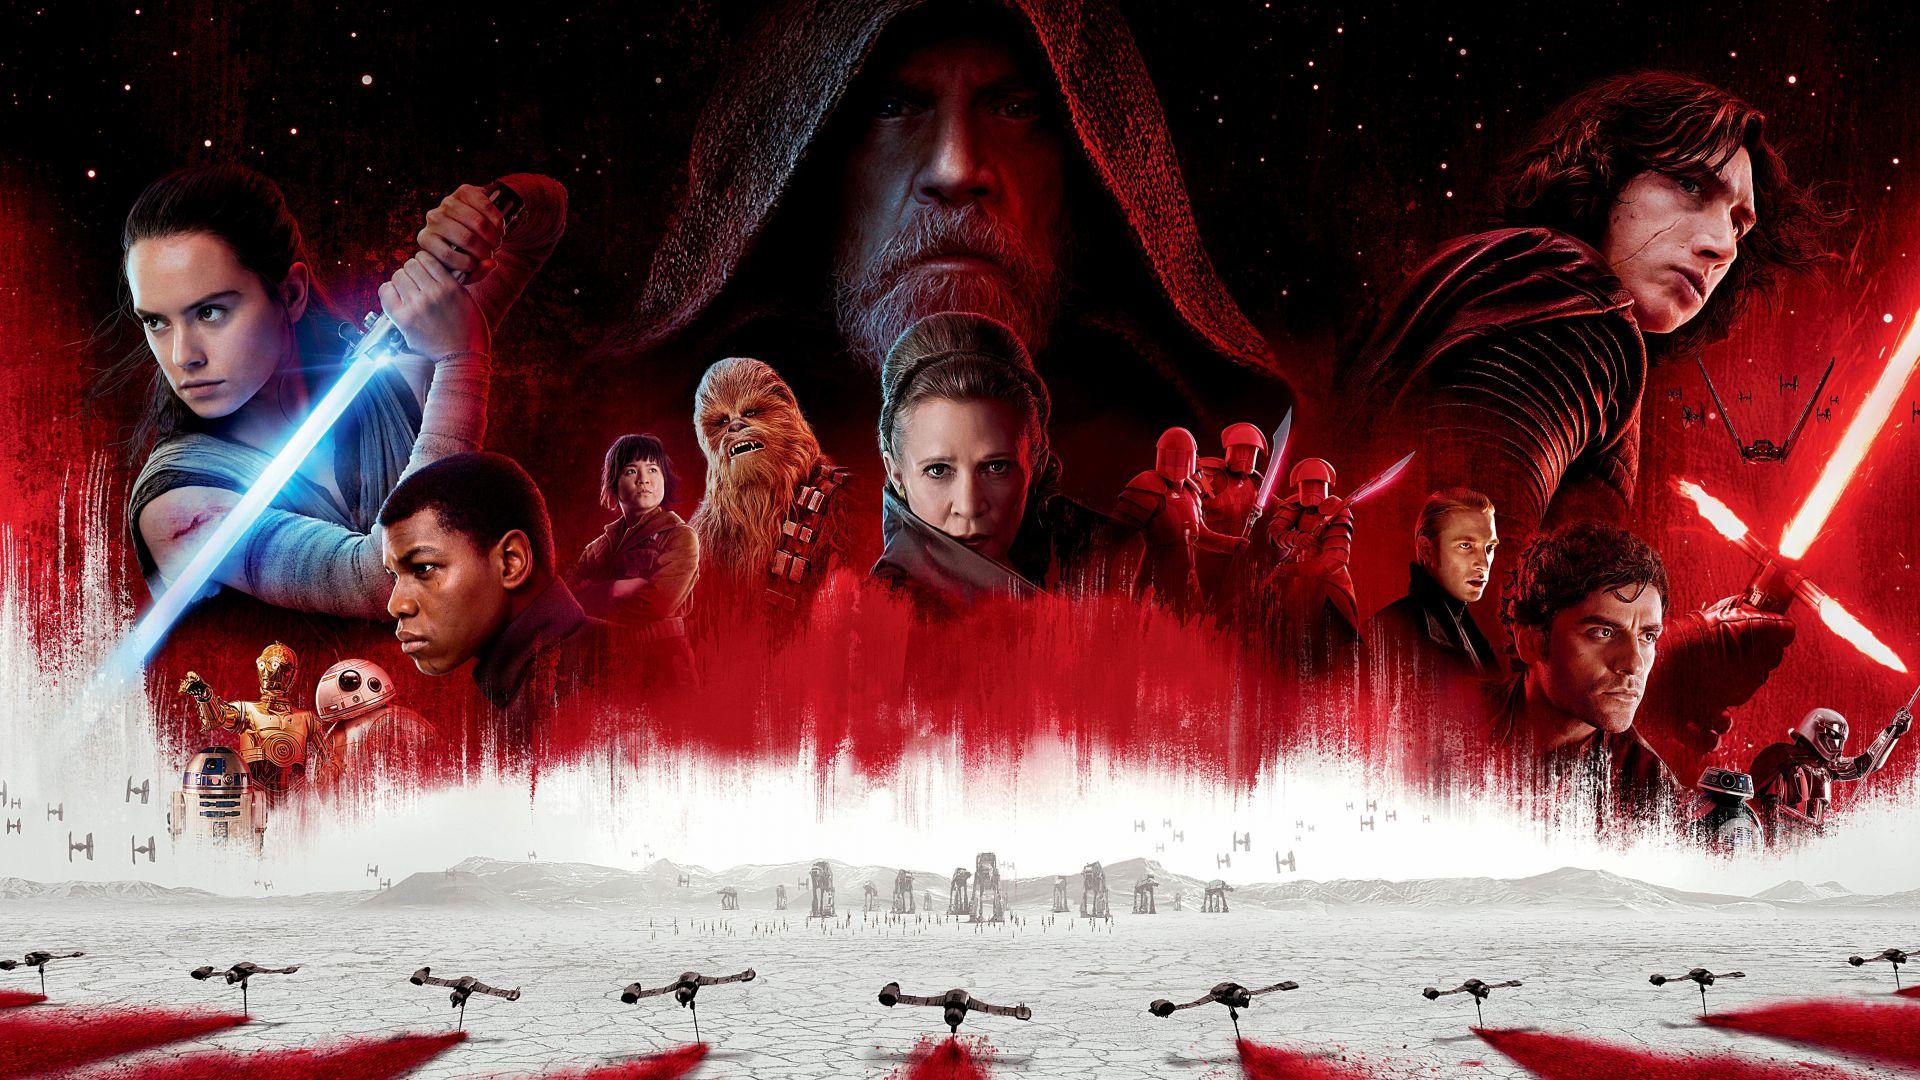 Desktop Wallpaper Star Wars The Last Jedi Movie Poster 2017 8k Hd Image Picture Background 2f9f87